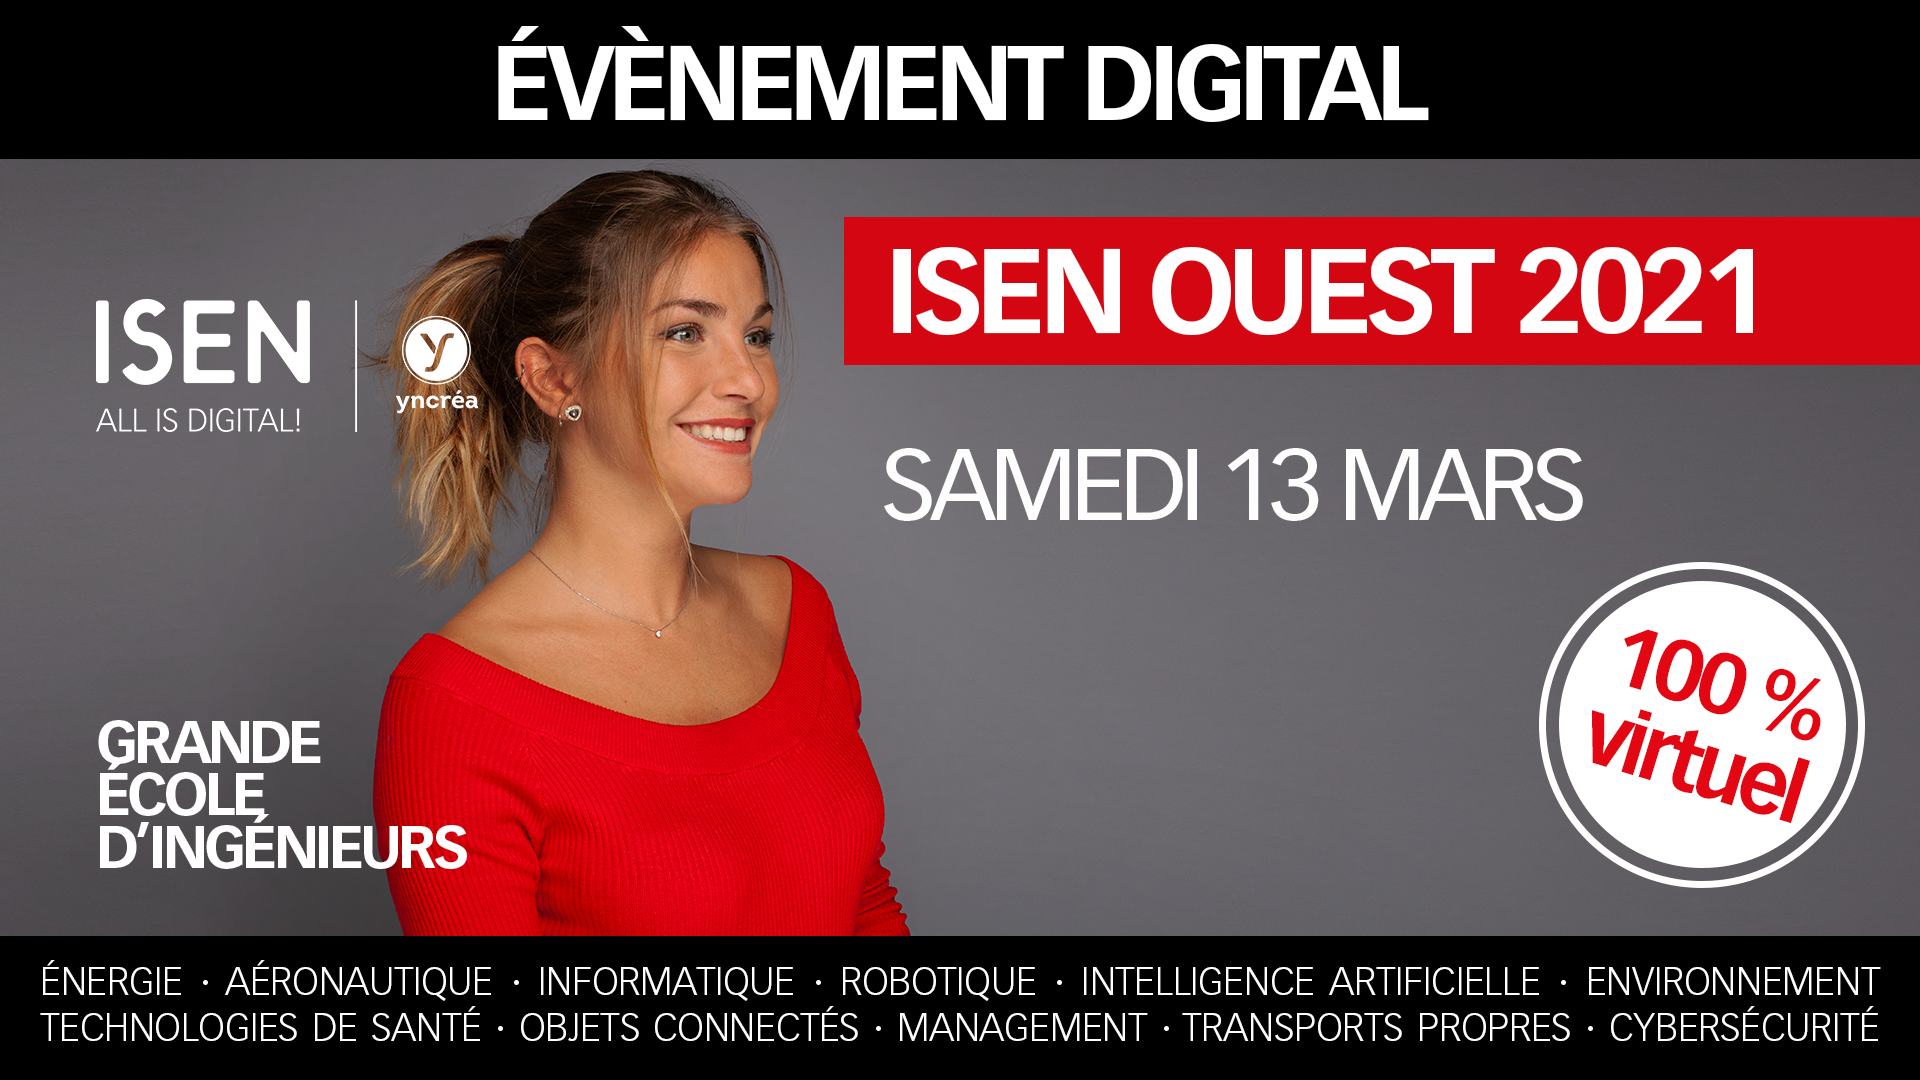 https://isen-brest.fr/portes-ouvertes-virtuelles-13-mars-2021/